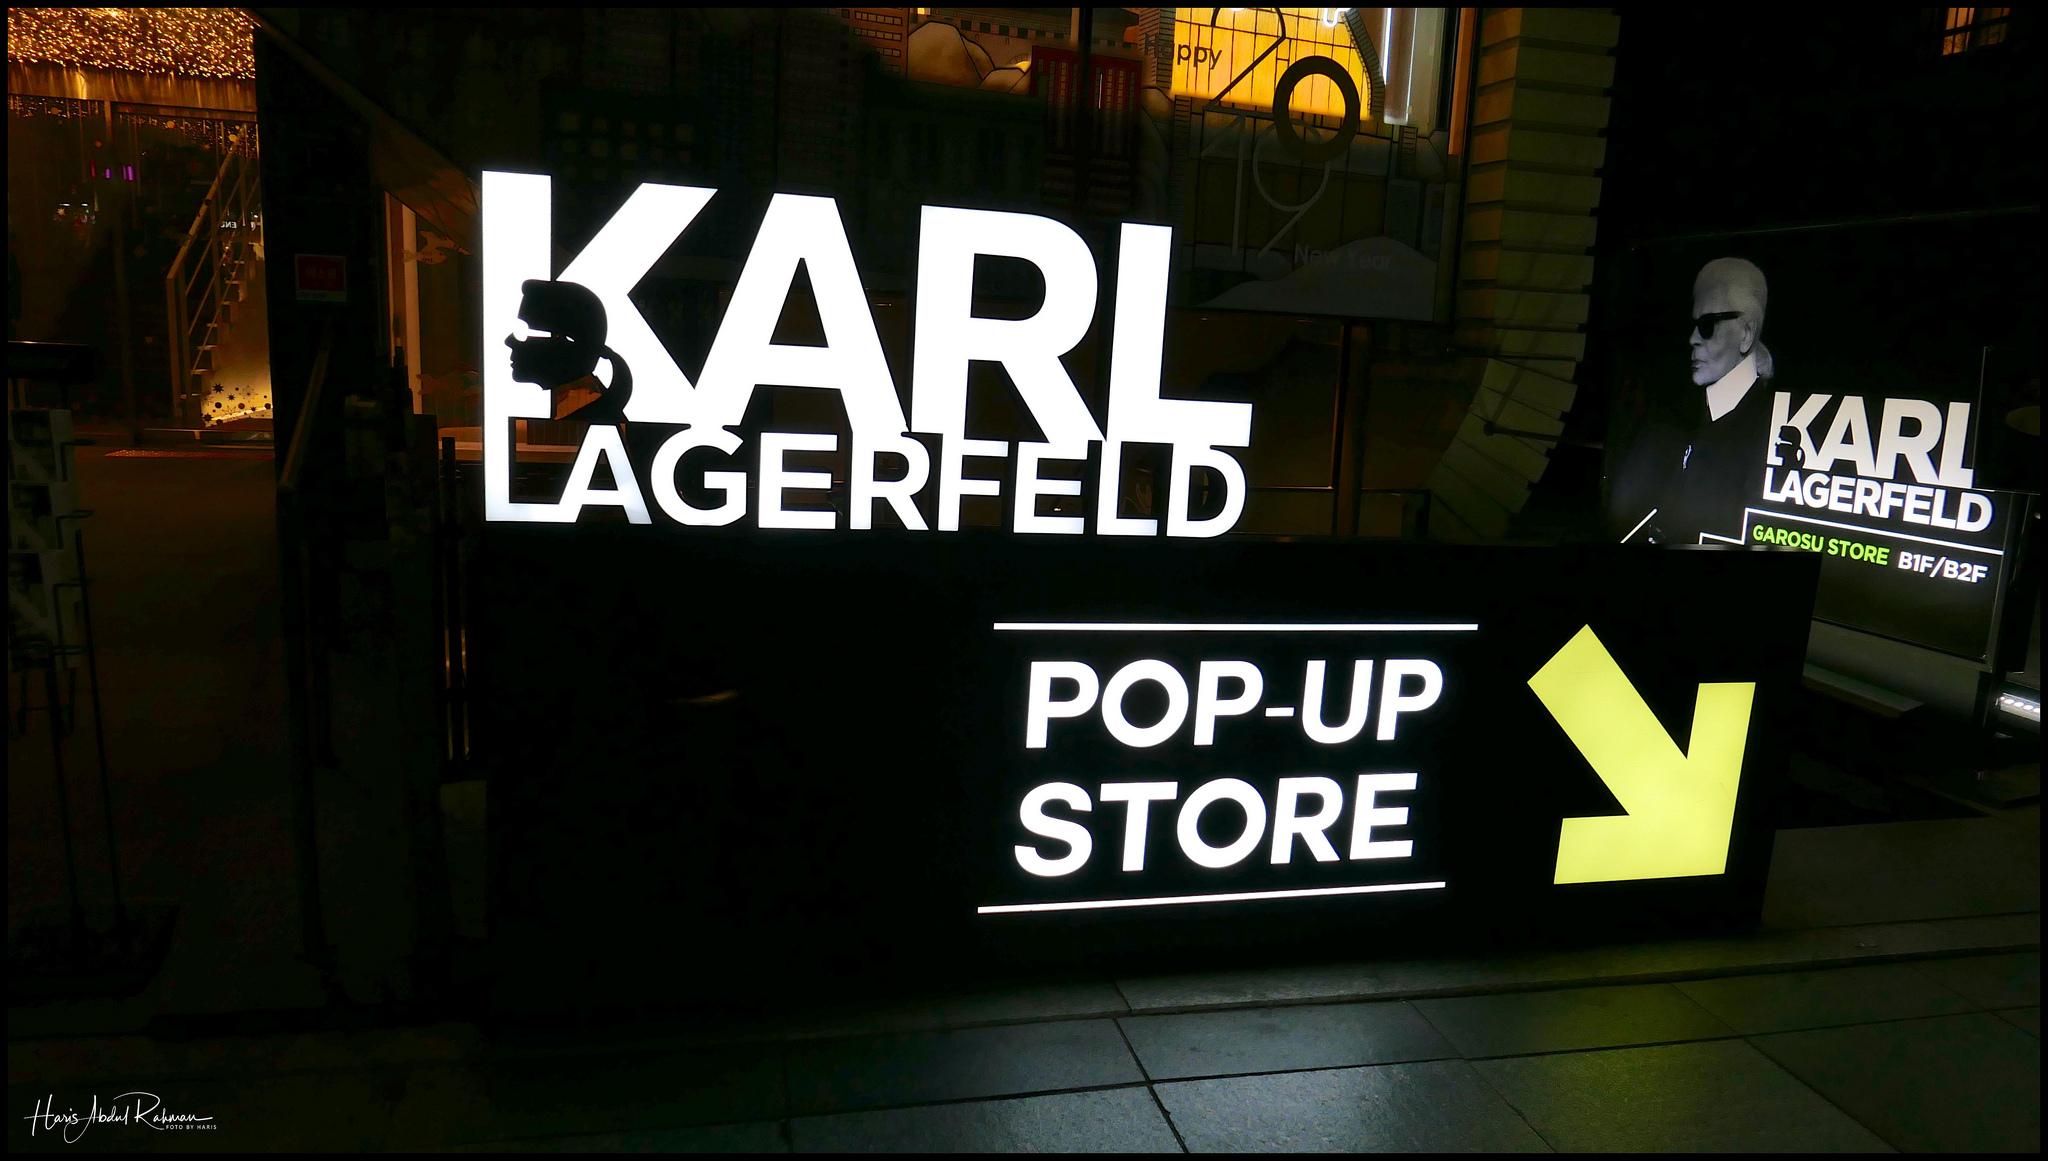 No, Karl wasn't in …